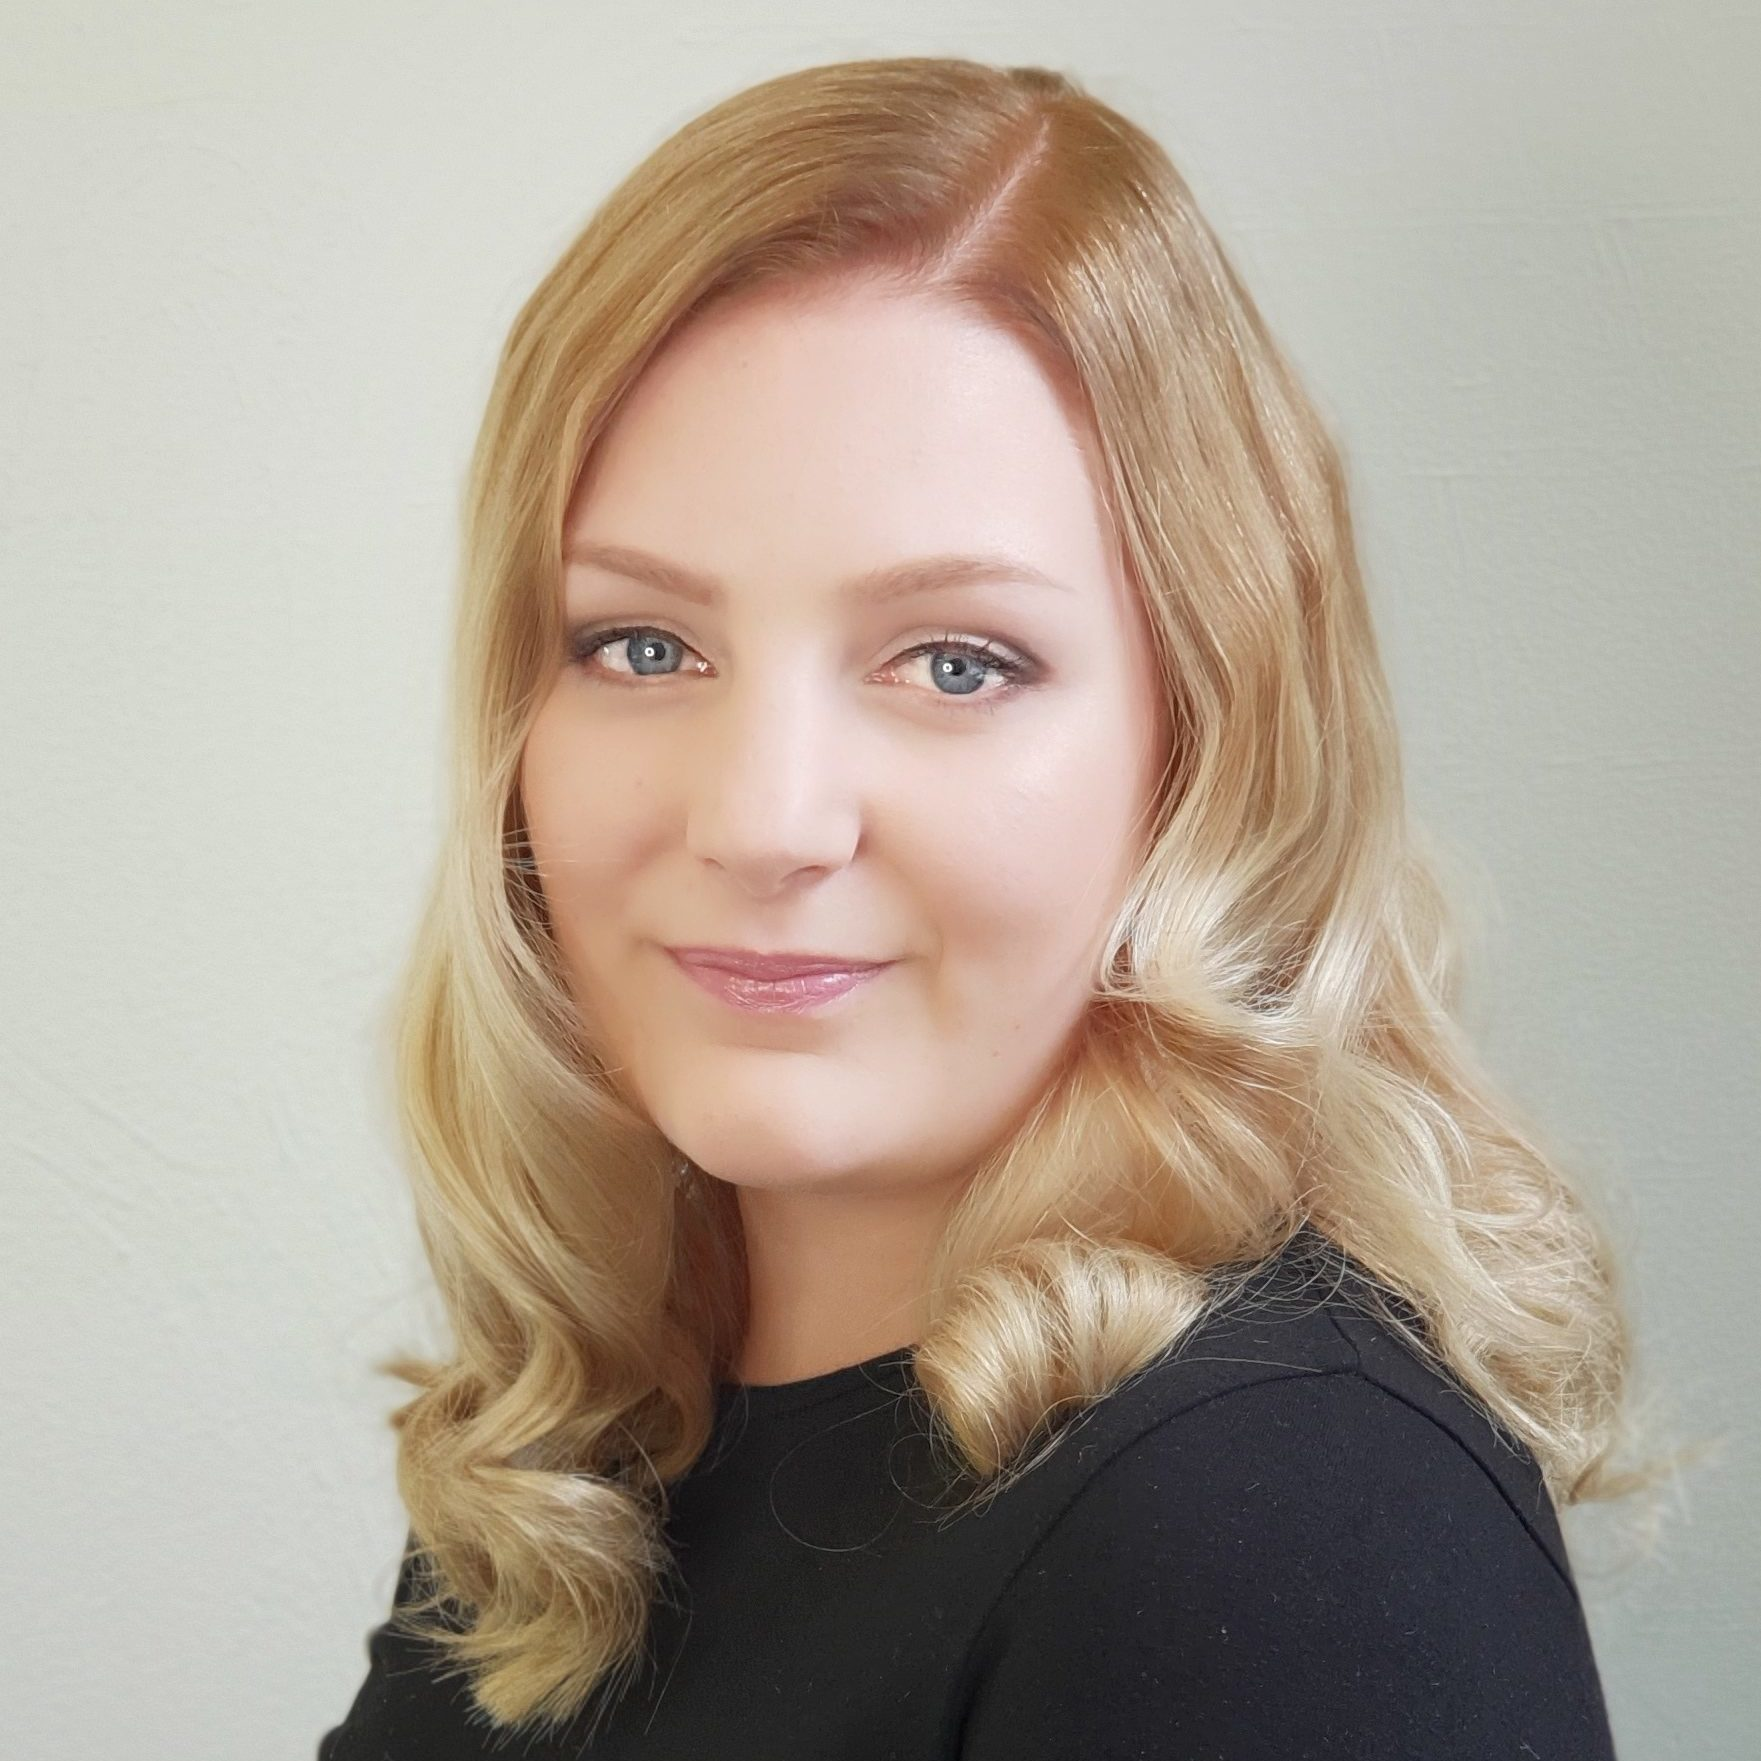 Isela Ahlqvist